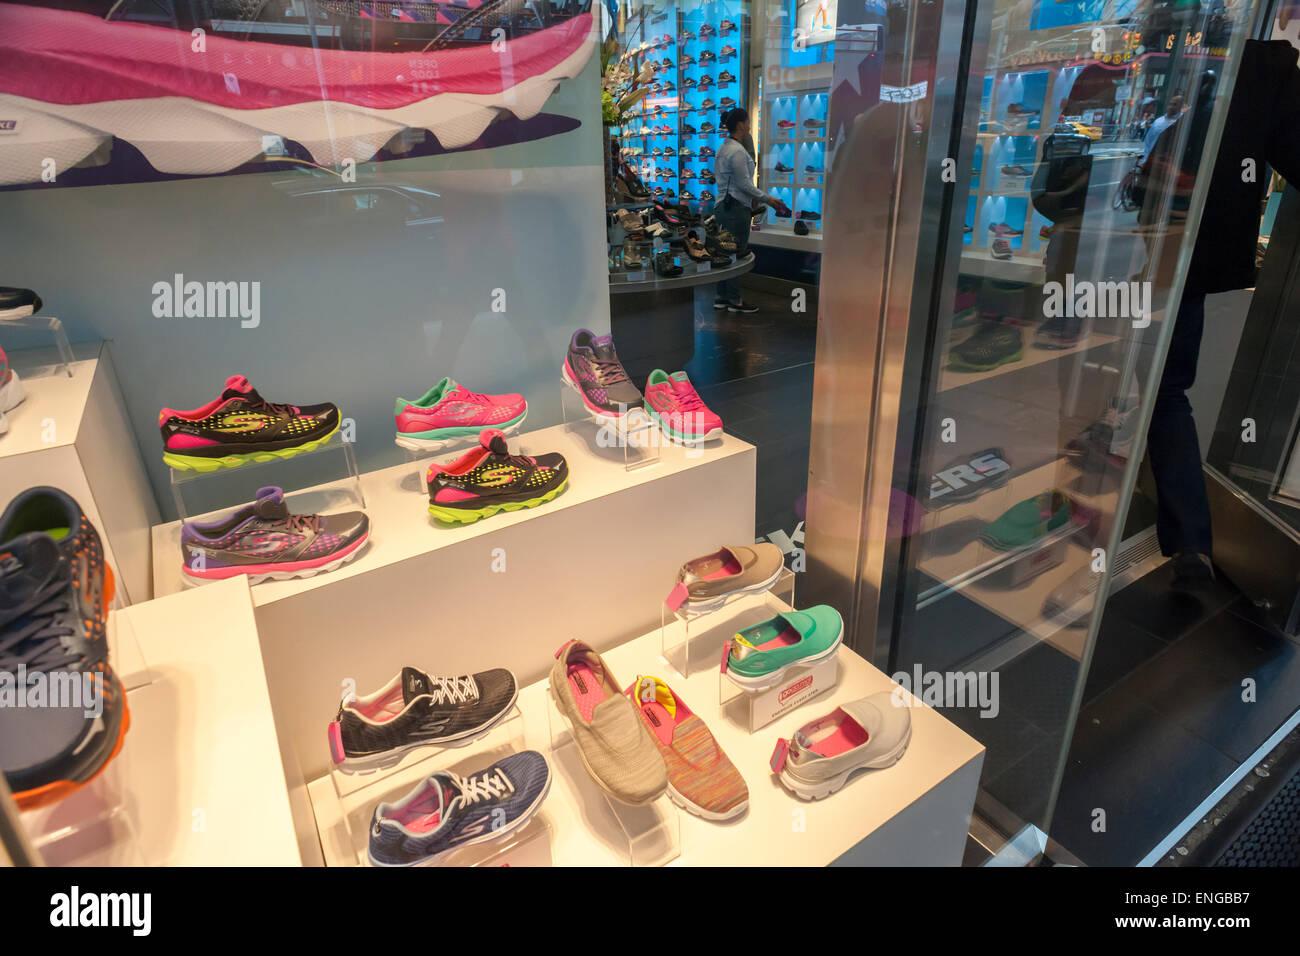 c4cfd743b5c823 Les Skechers store à Times Square à New York, le vendredi 1er mai 2015.